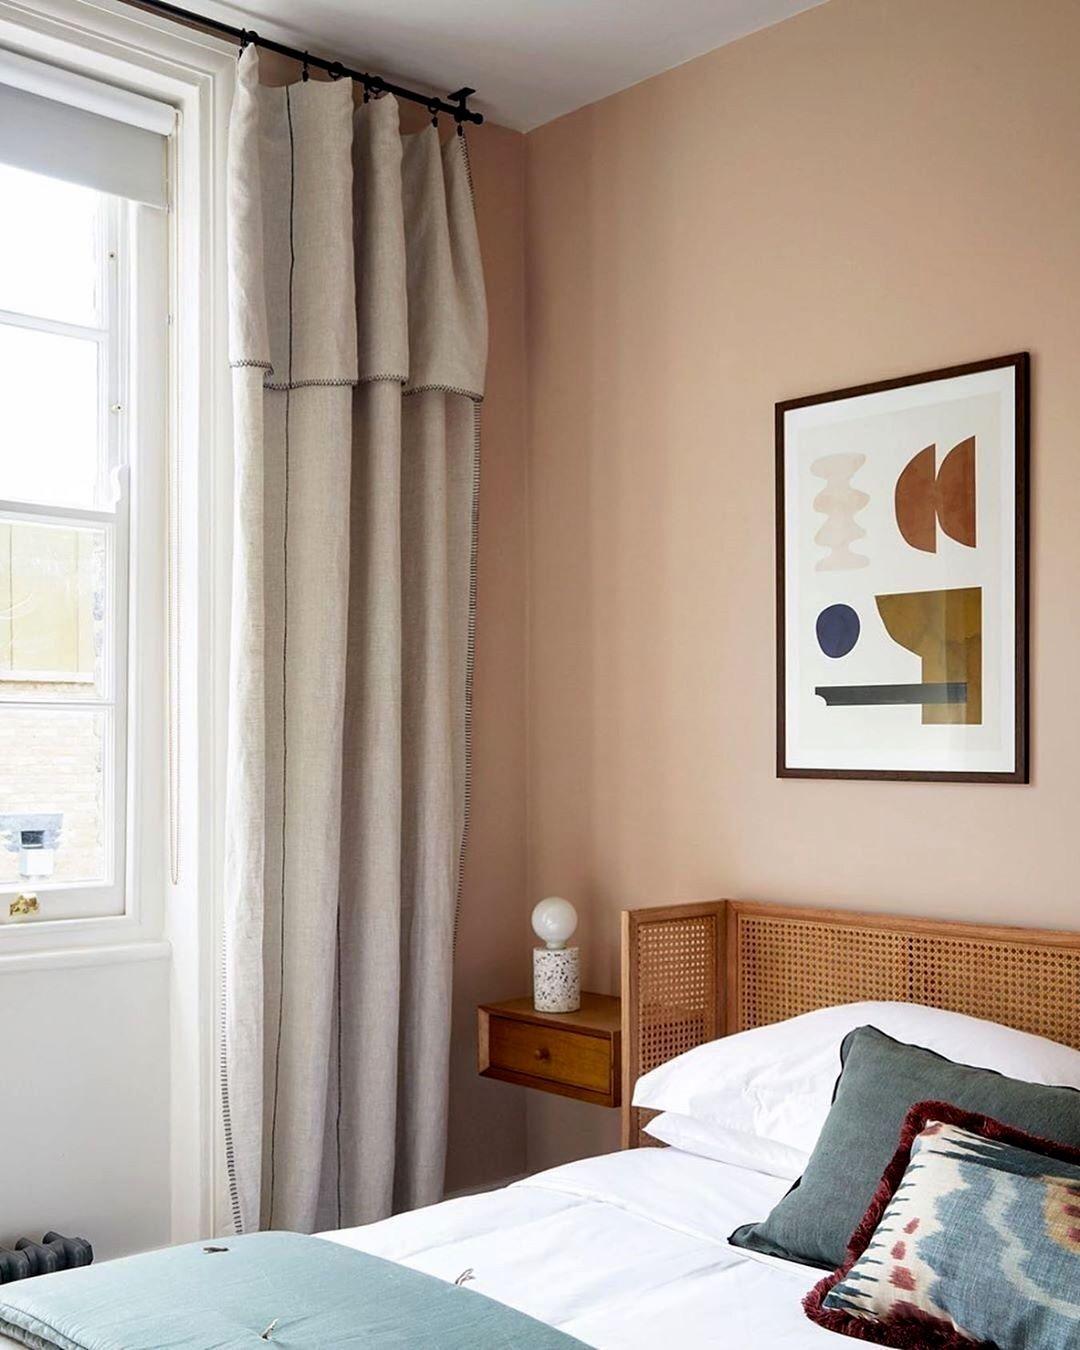 Pin by Kariiina on Interior design in 2020 Pink bedroom